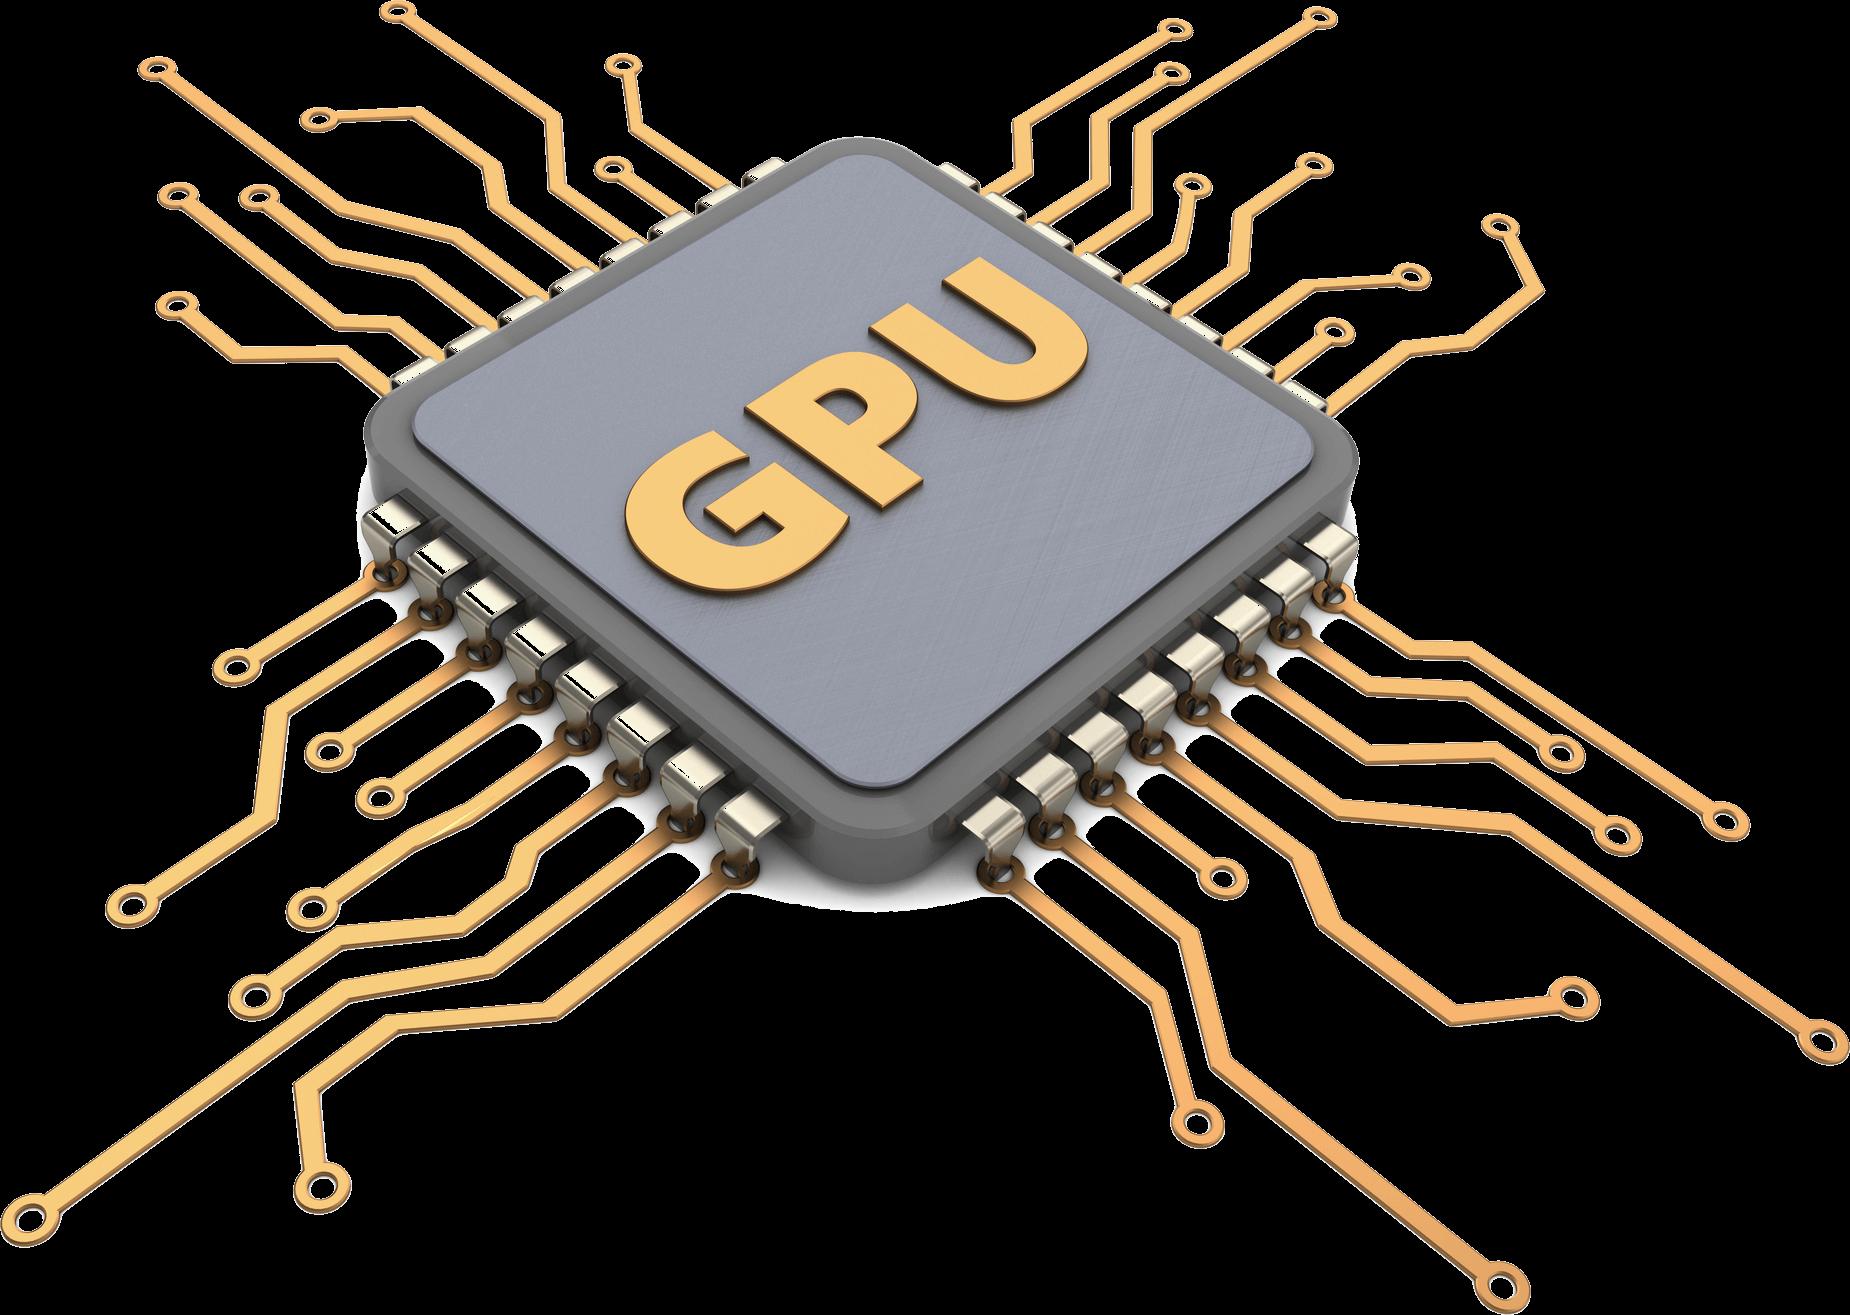 VERDE VDI 支持大多数流行的 GPU 卡,包括 Virtual GPU (GRID) 和 GPU Passthrough